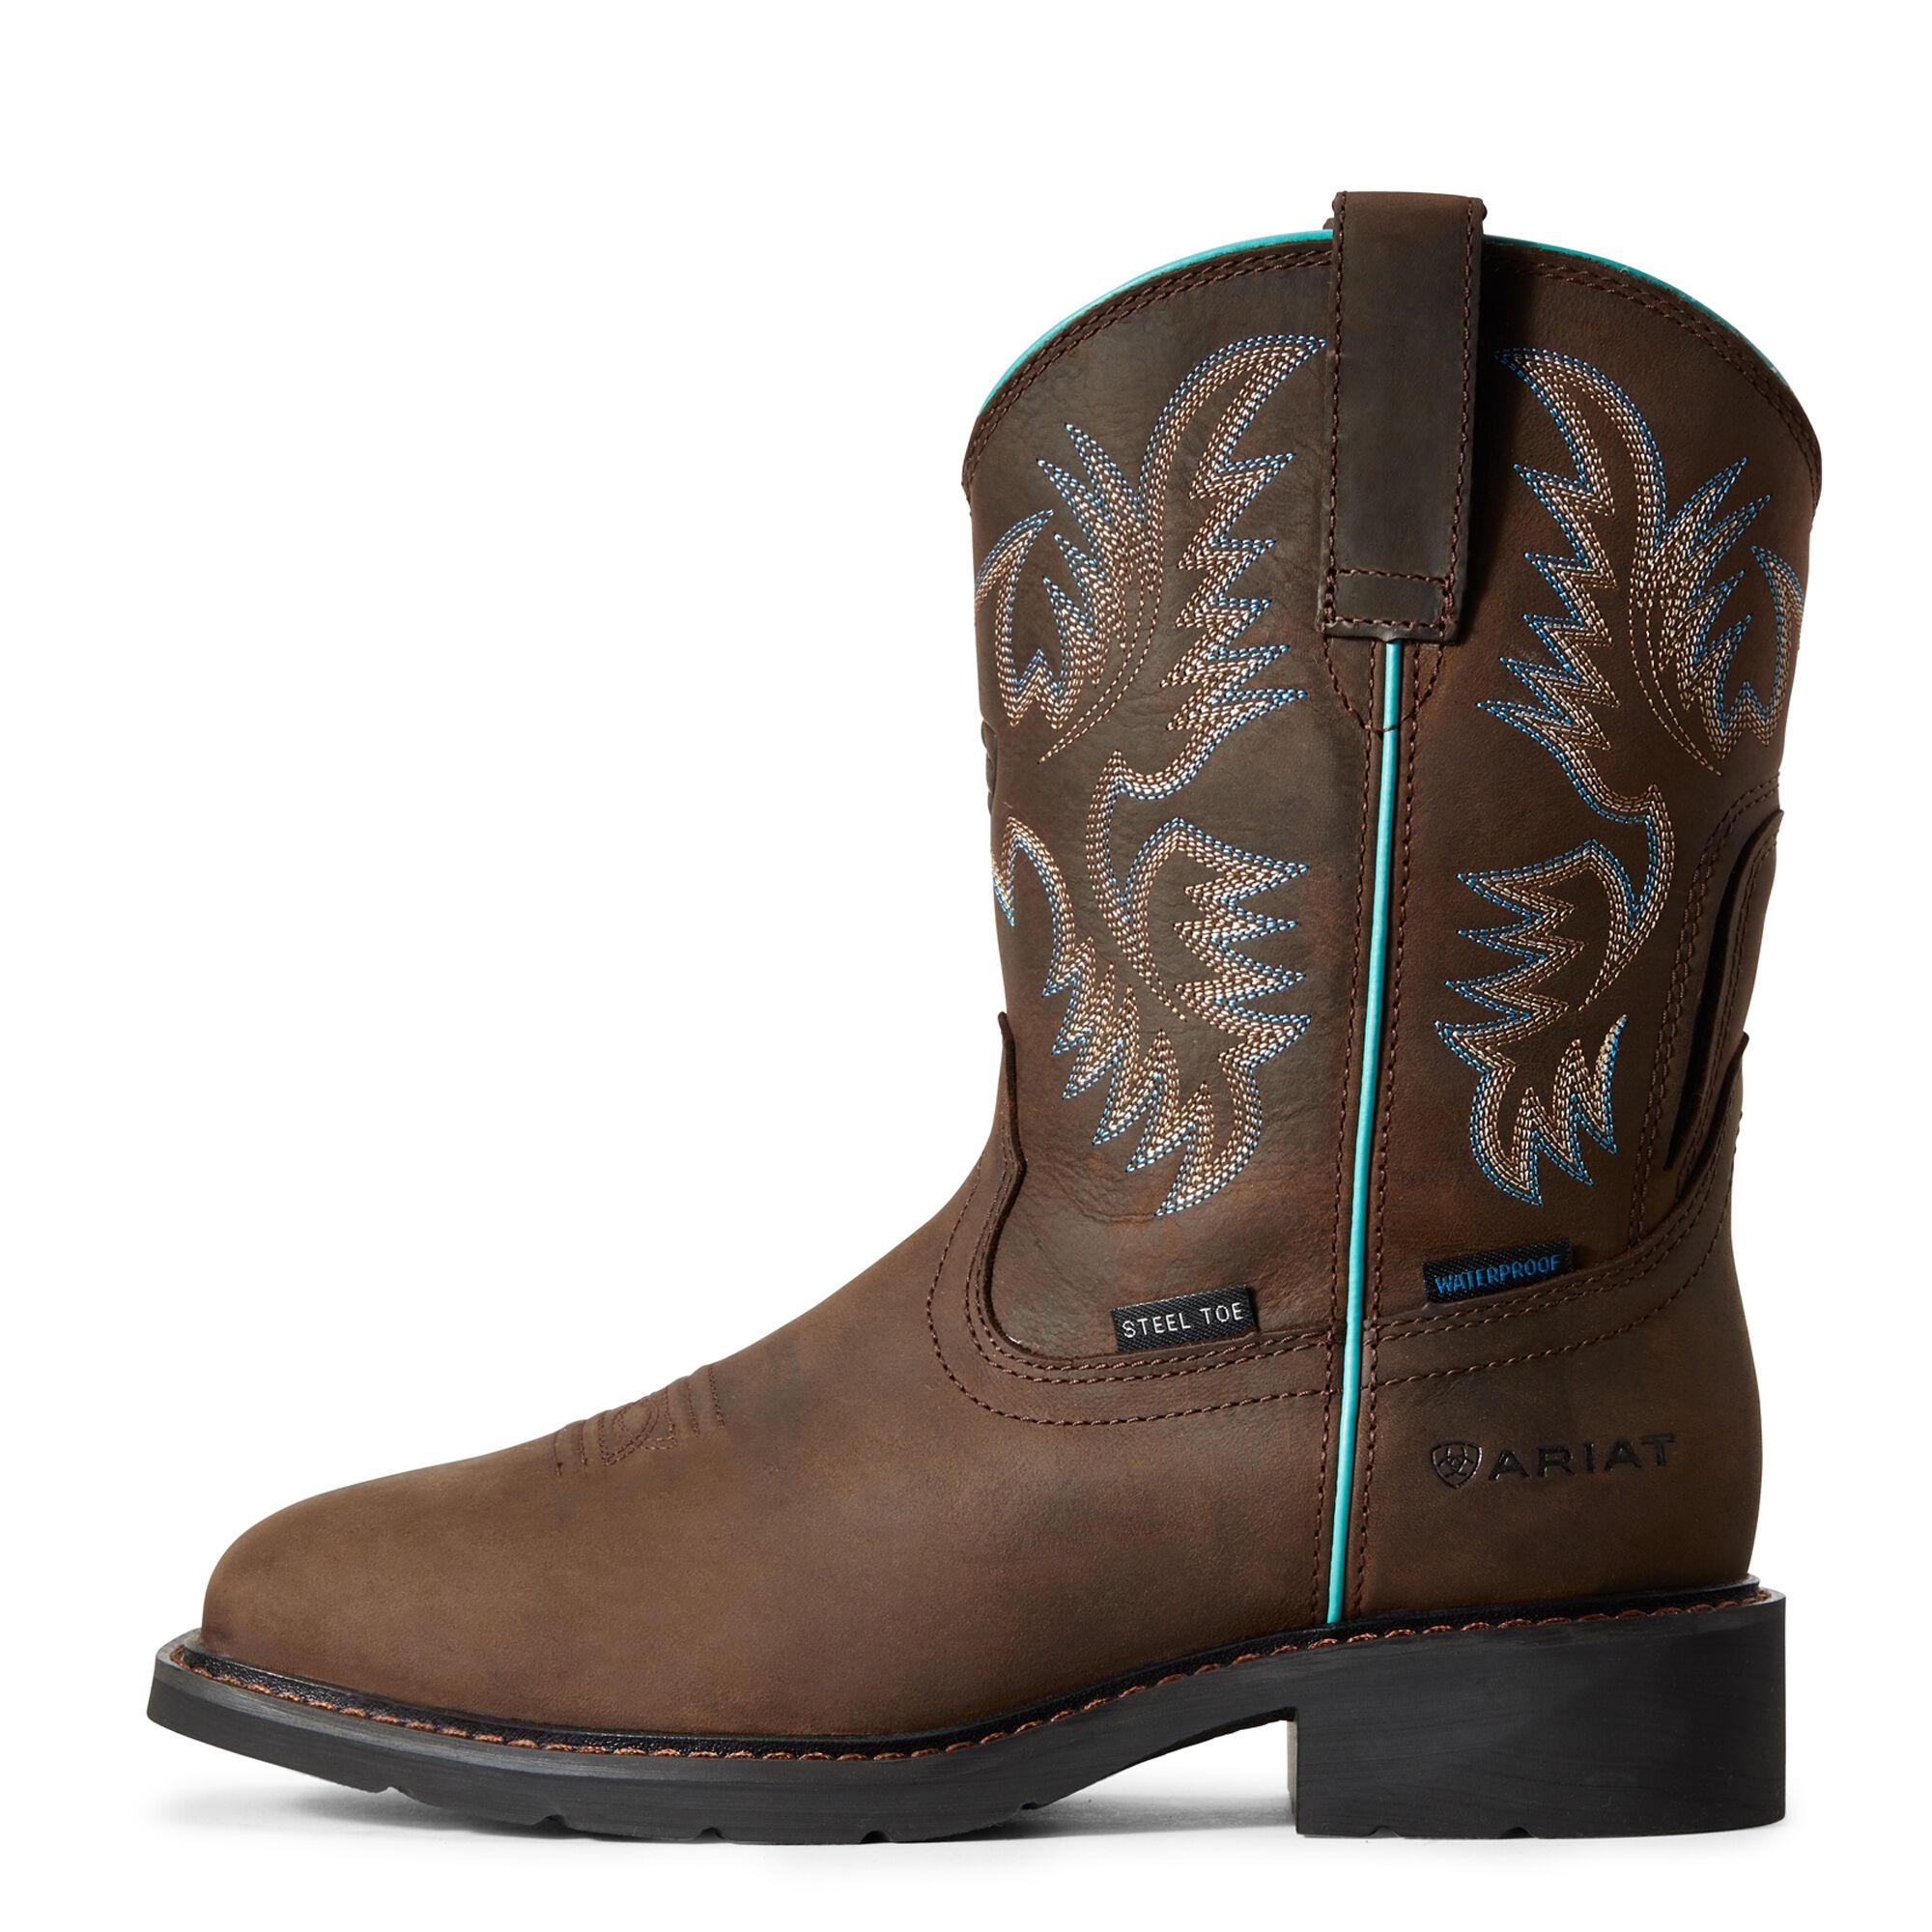 Krista Waterproof Steel Toe Work Boot